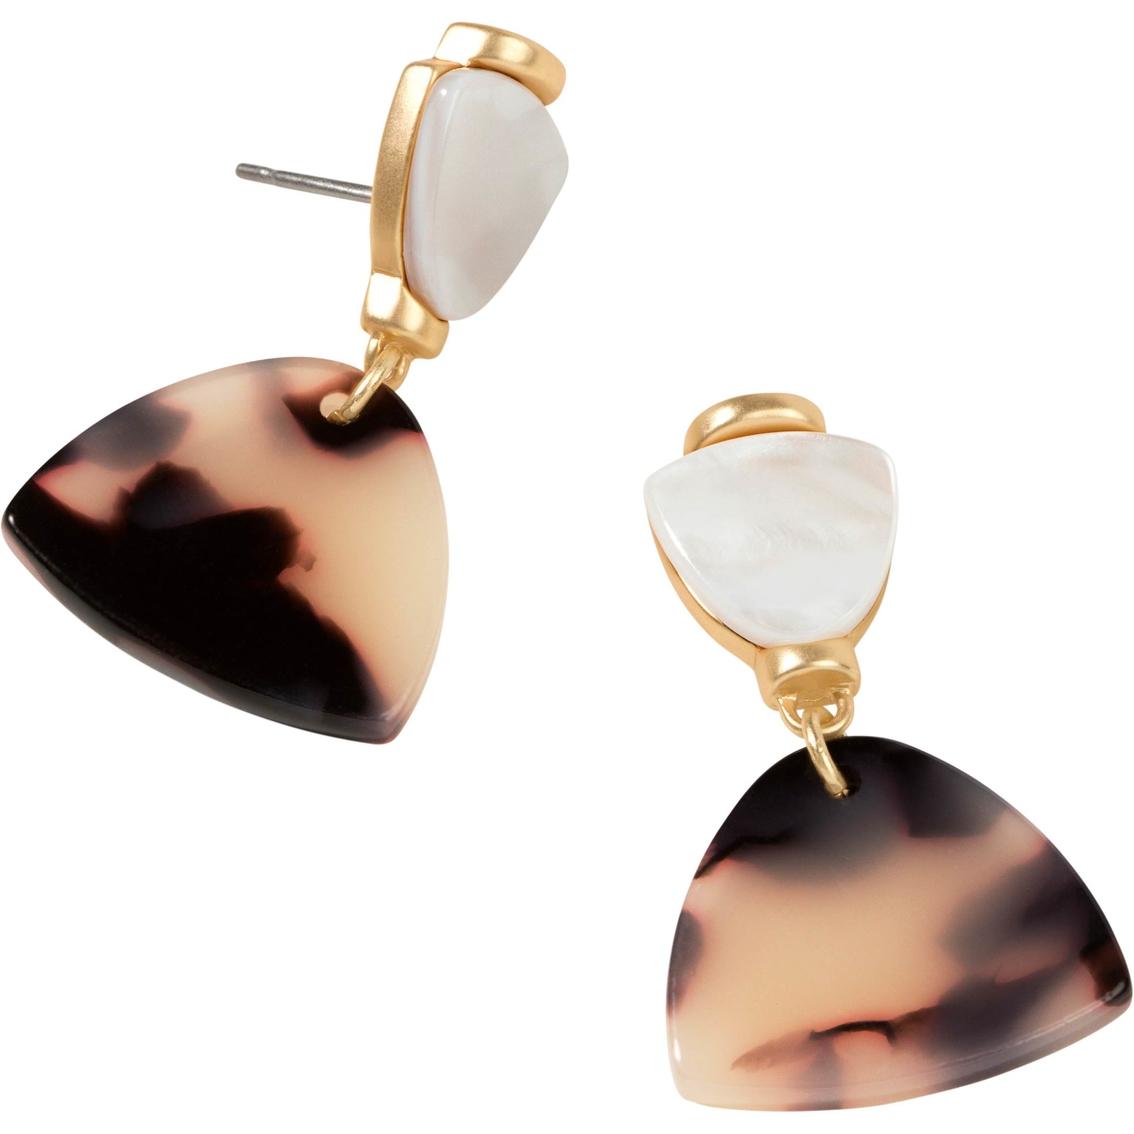 Spartina 449 Hamilton Earrings   Fashion Earrings   Jewelry